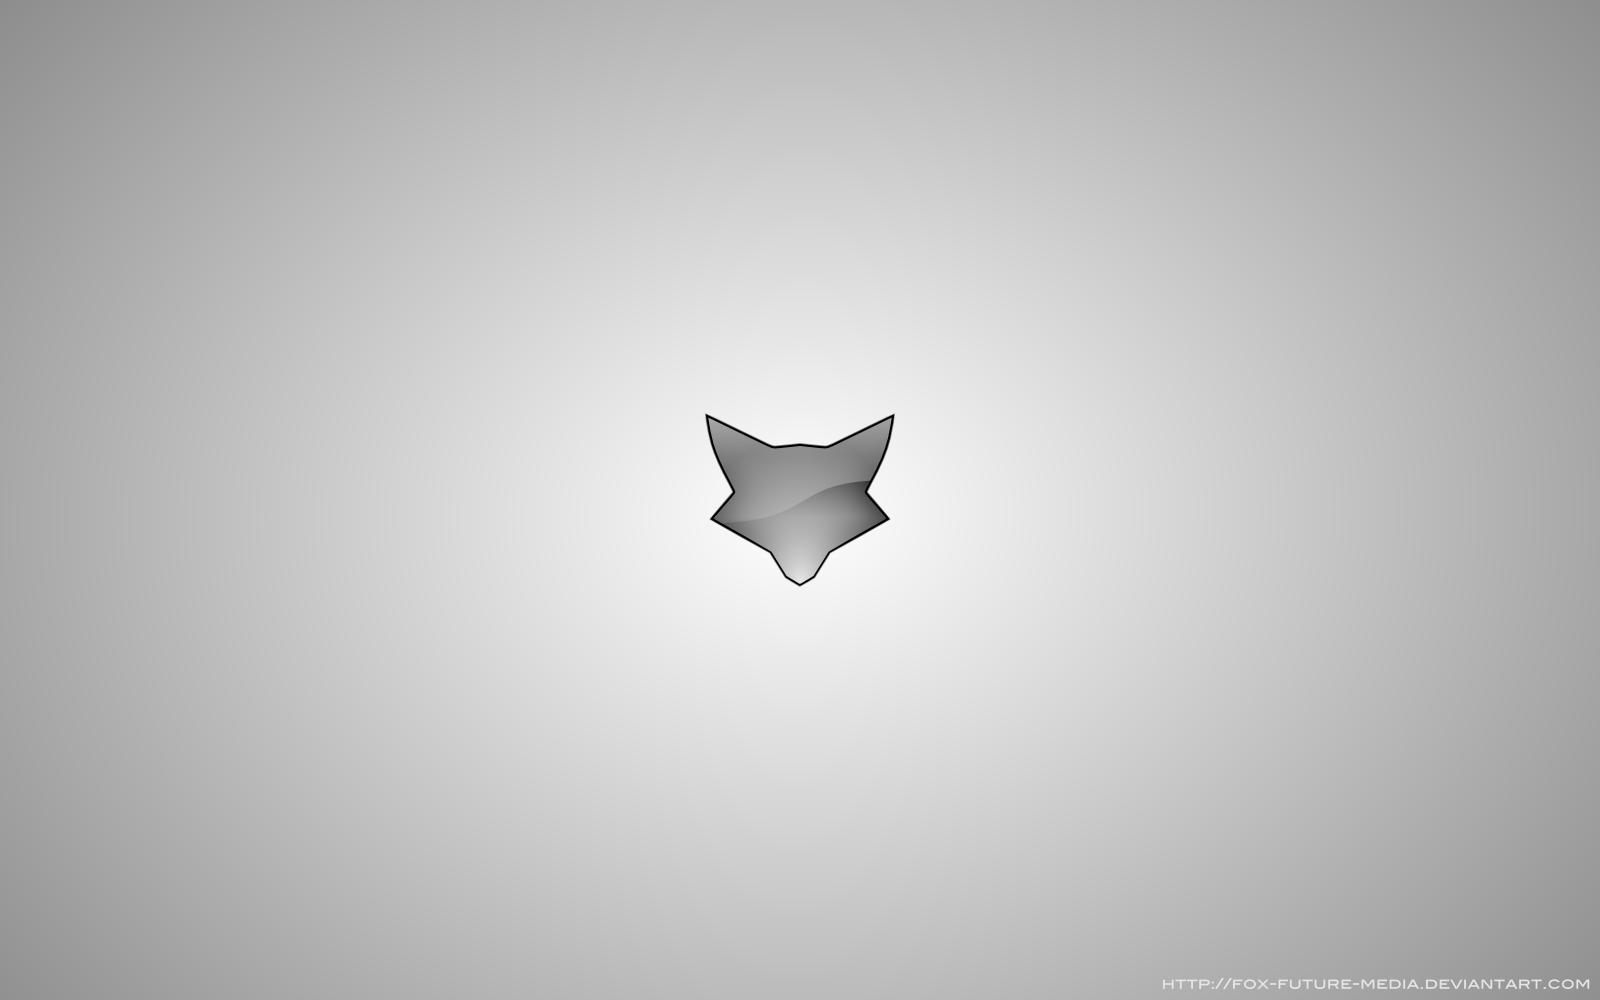 The Silver Fox Wallpaper By Fox Future Media On Deviantart